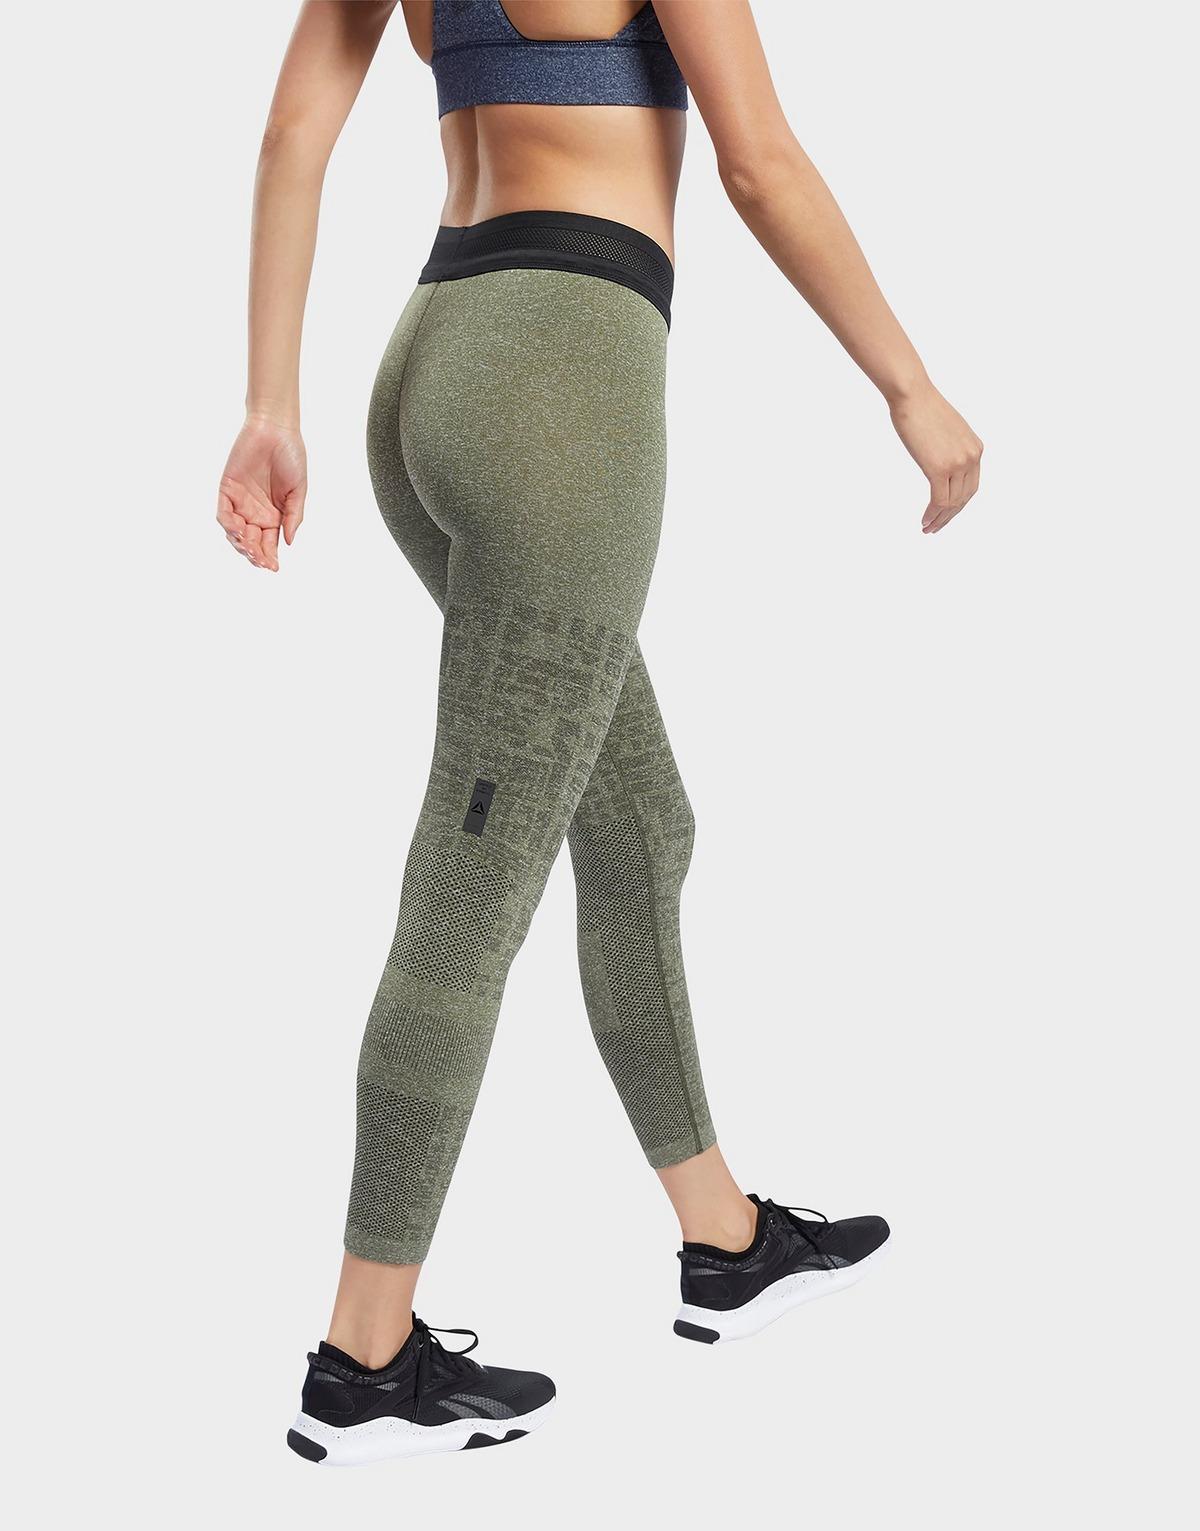 Reebok United By Fitness Myoknit Seamless 7/8 Leggings